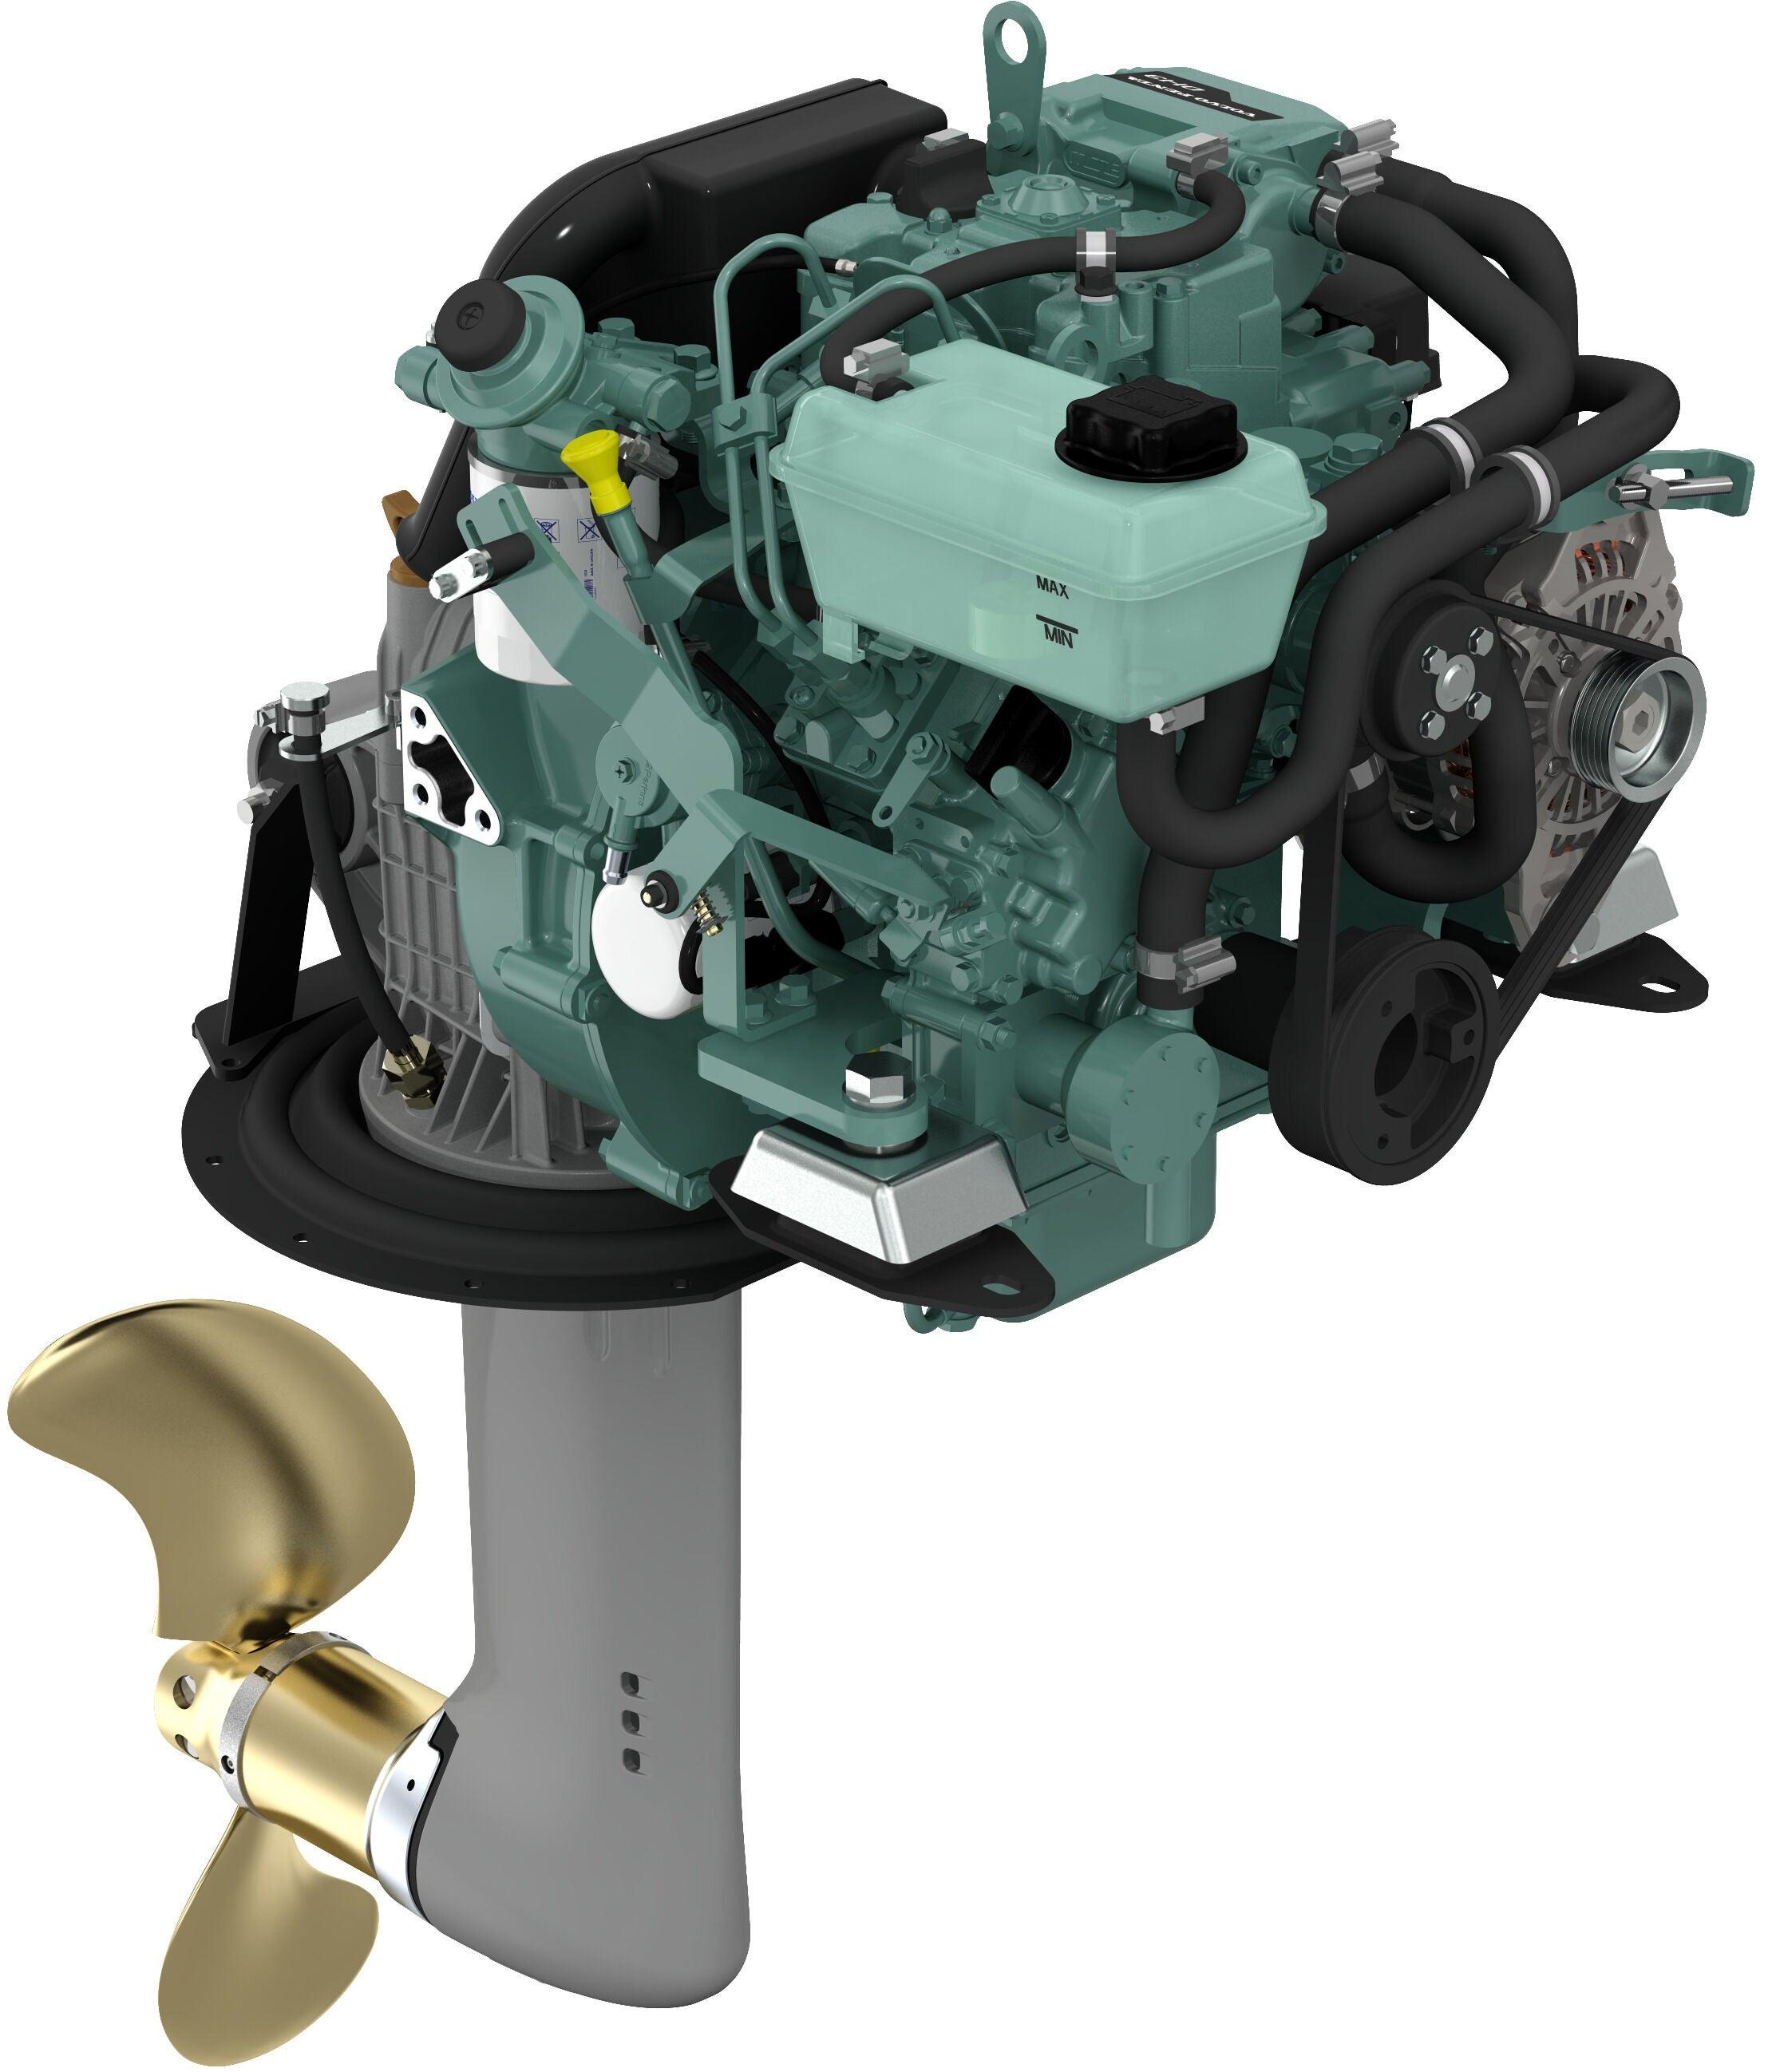 Volvo Penta D1-13 Bootsmotor mit Saildrive 130S